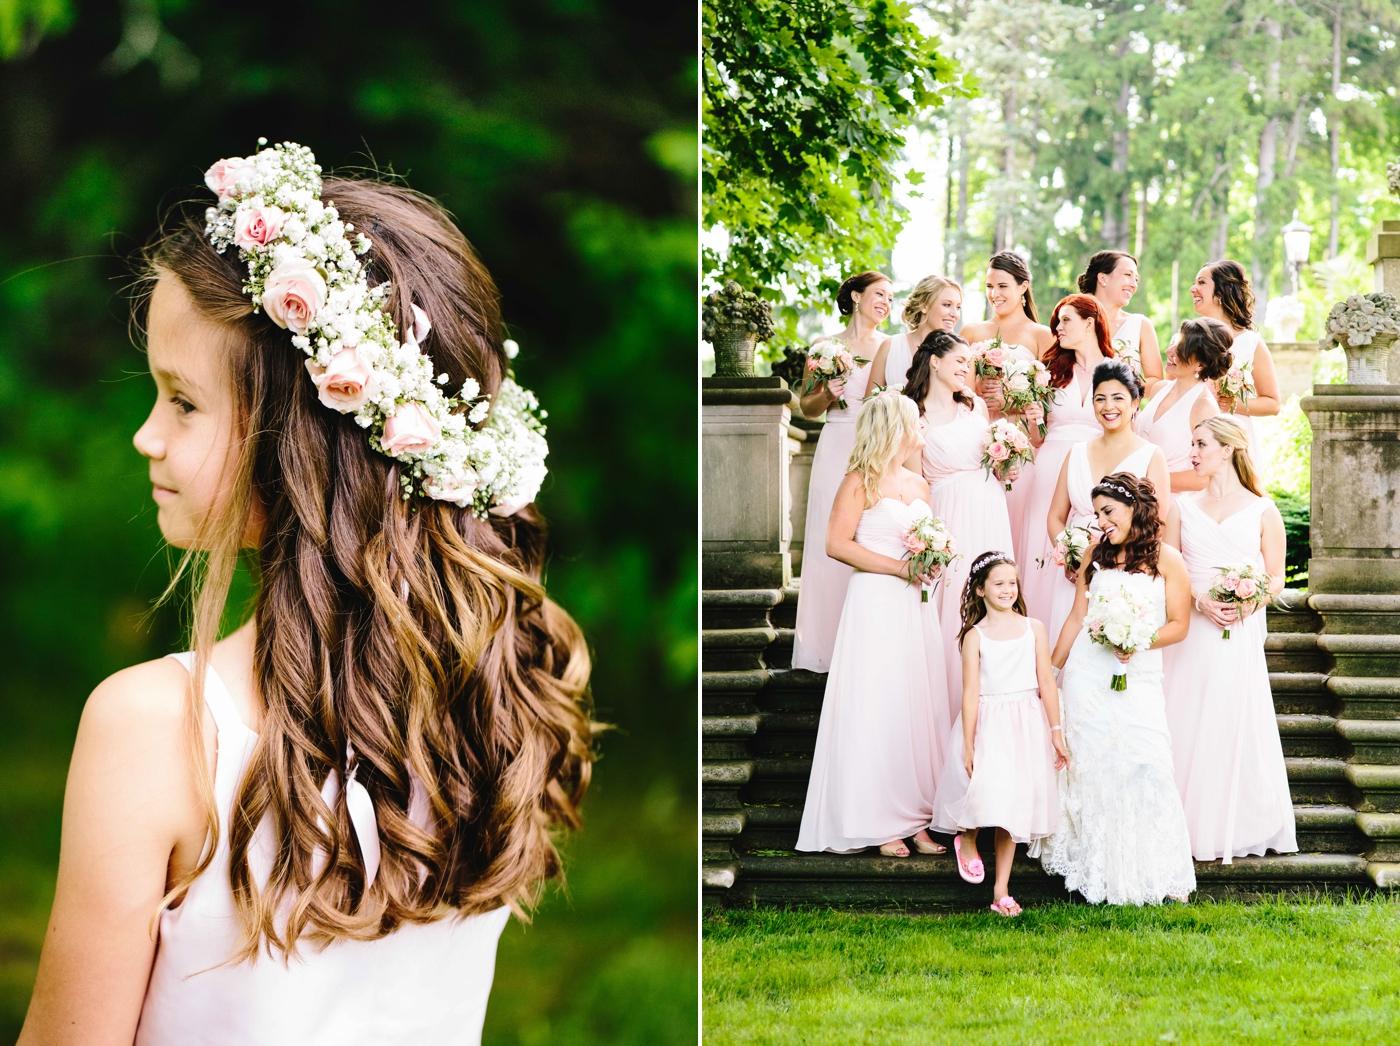 chicago-fine-art-wedding-photography-svihra8